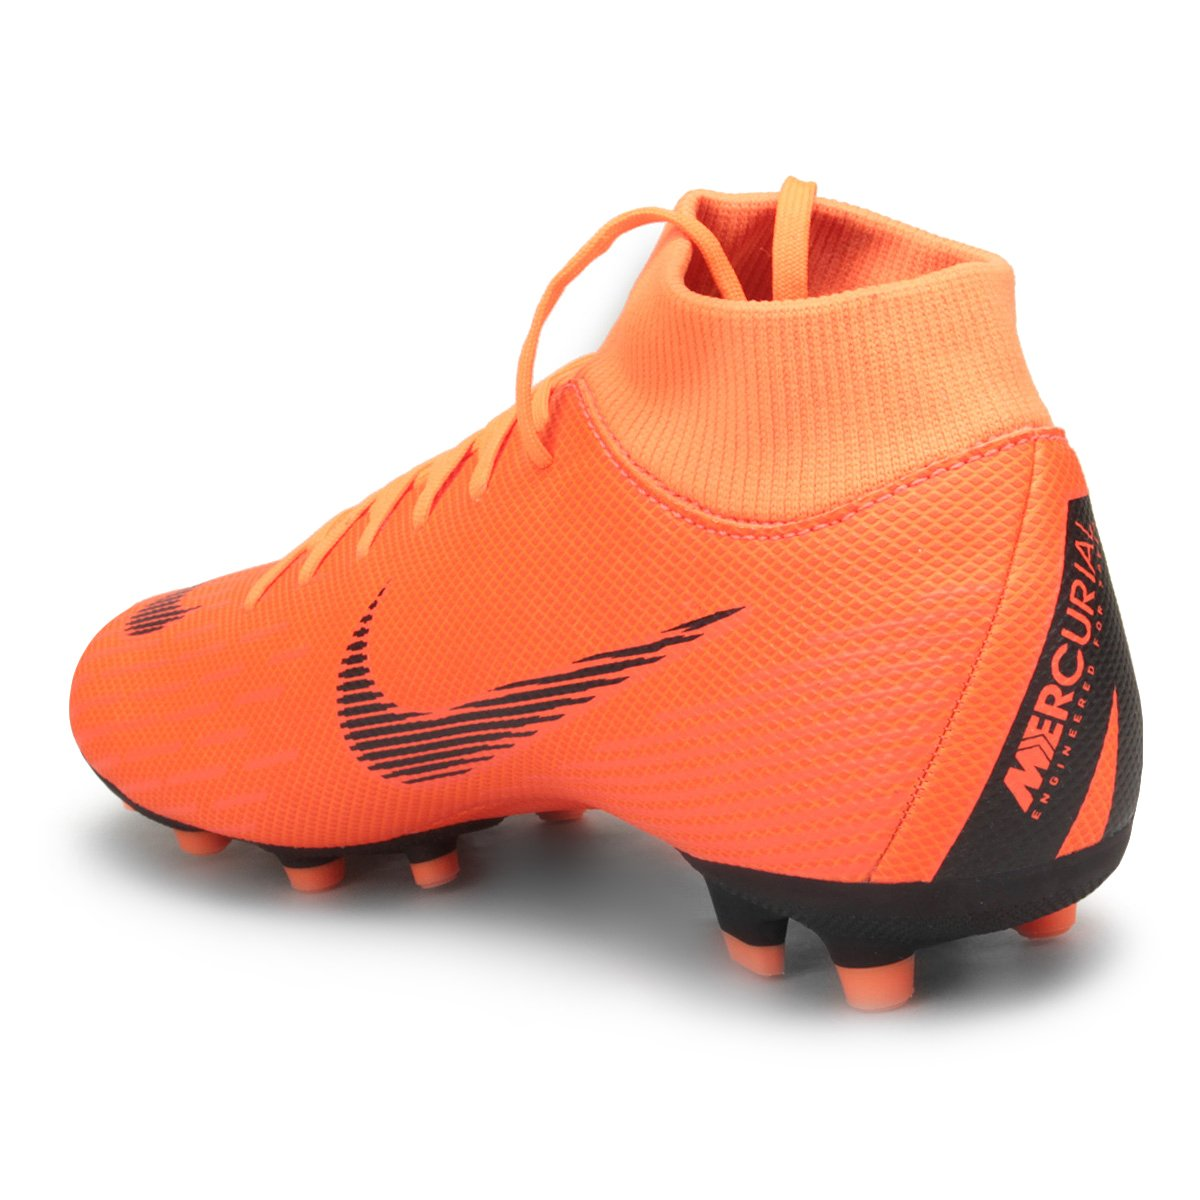 234577edf7 Chuteira Campo Nike Mercurial Superfly 6 Academy